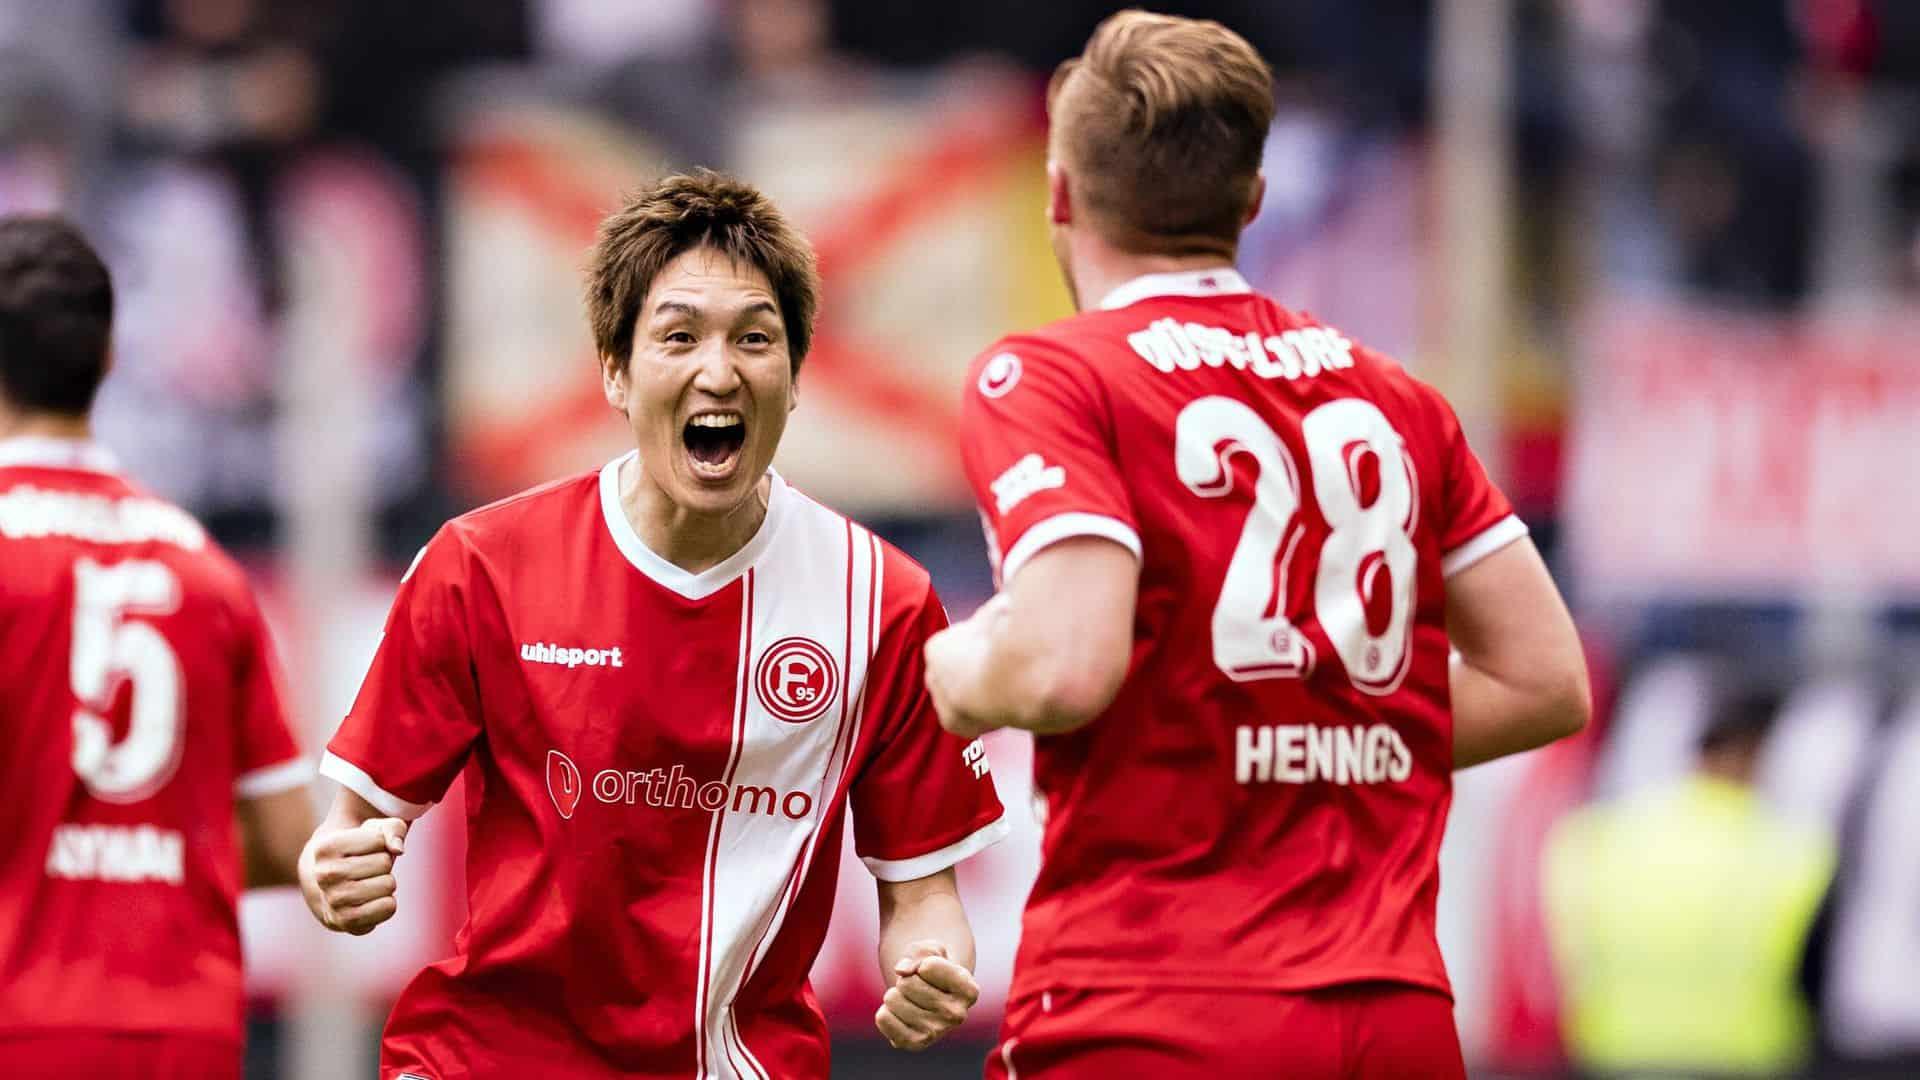 Fortuna Düsseldorf soccer team 2019